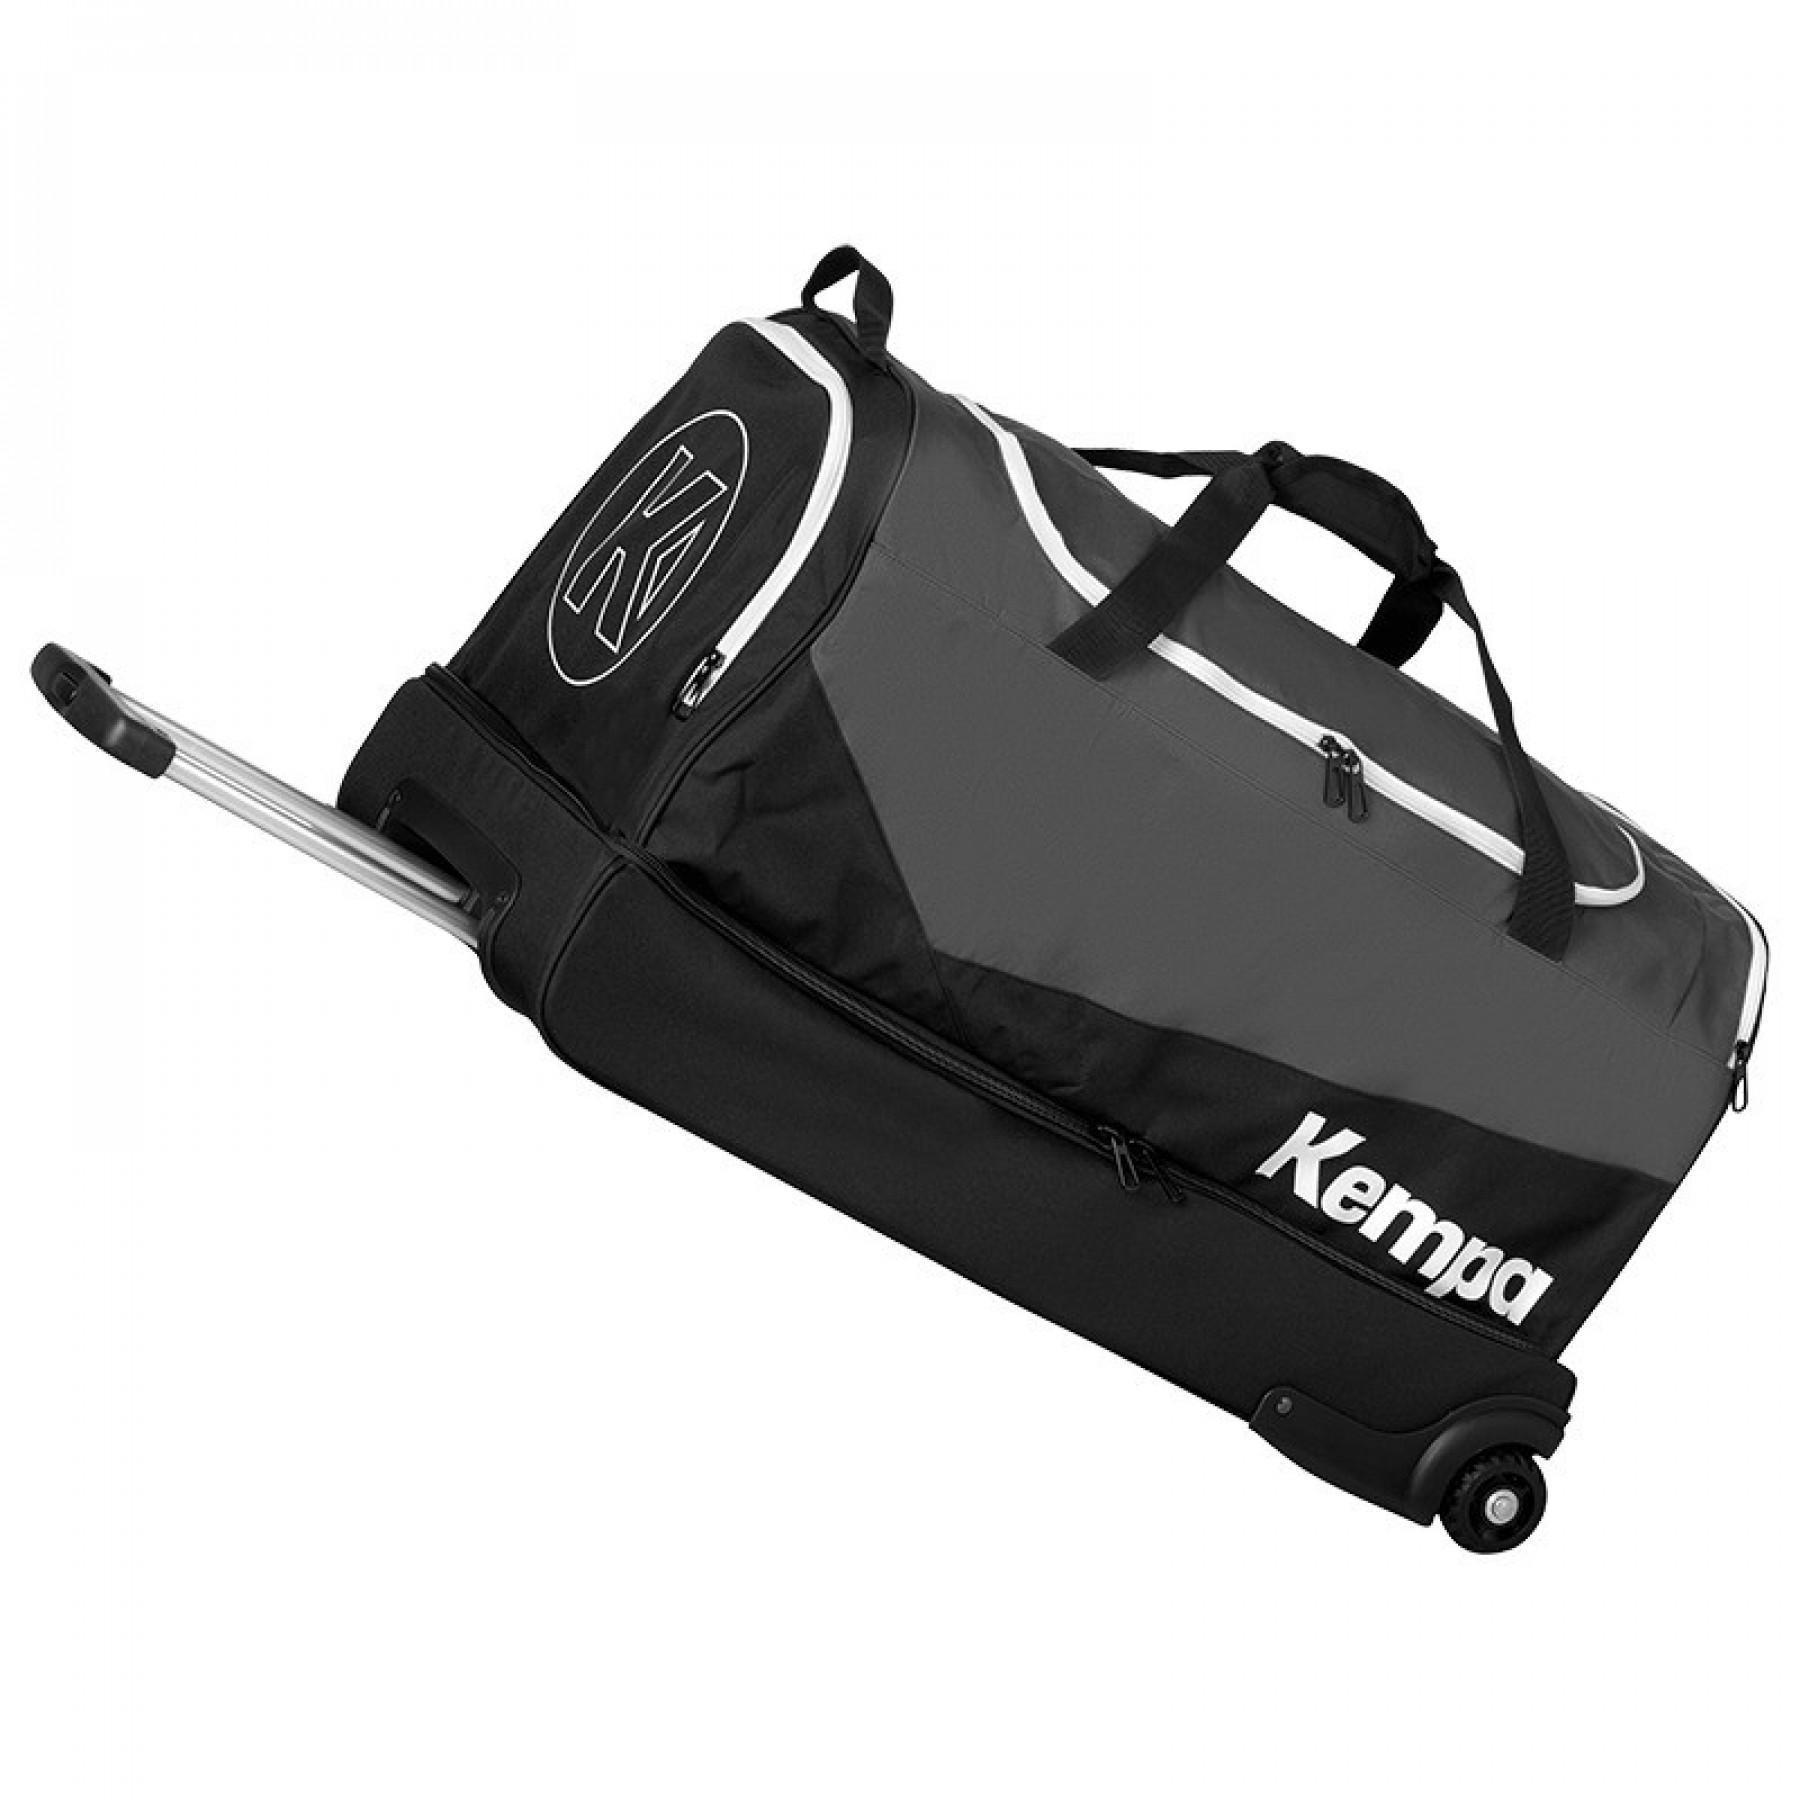 Trolley bag Kempa Xtra Large